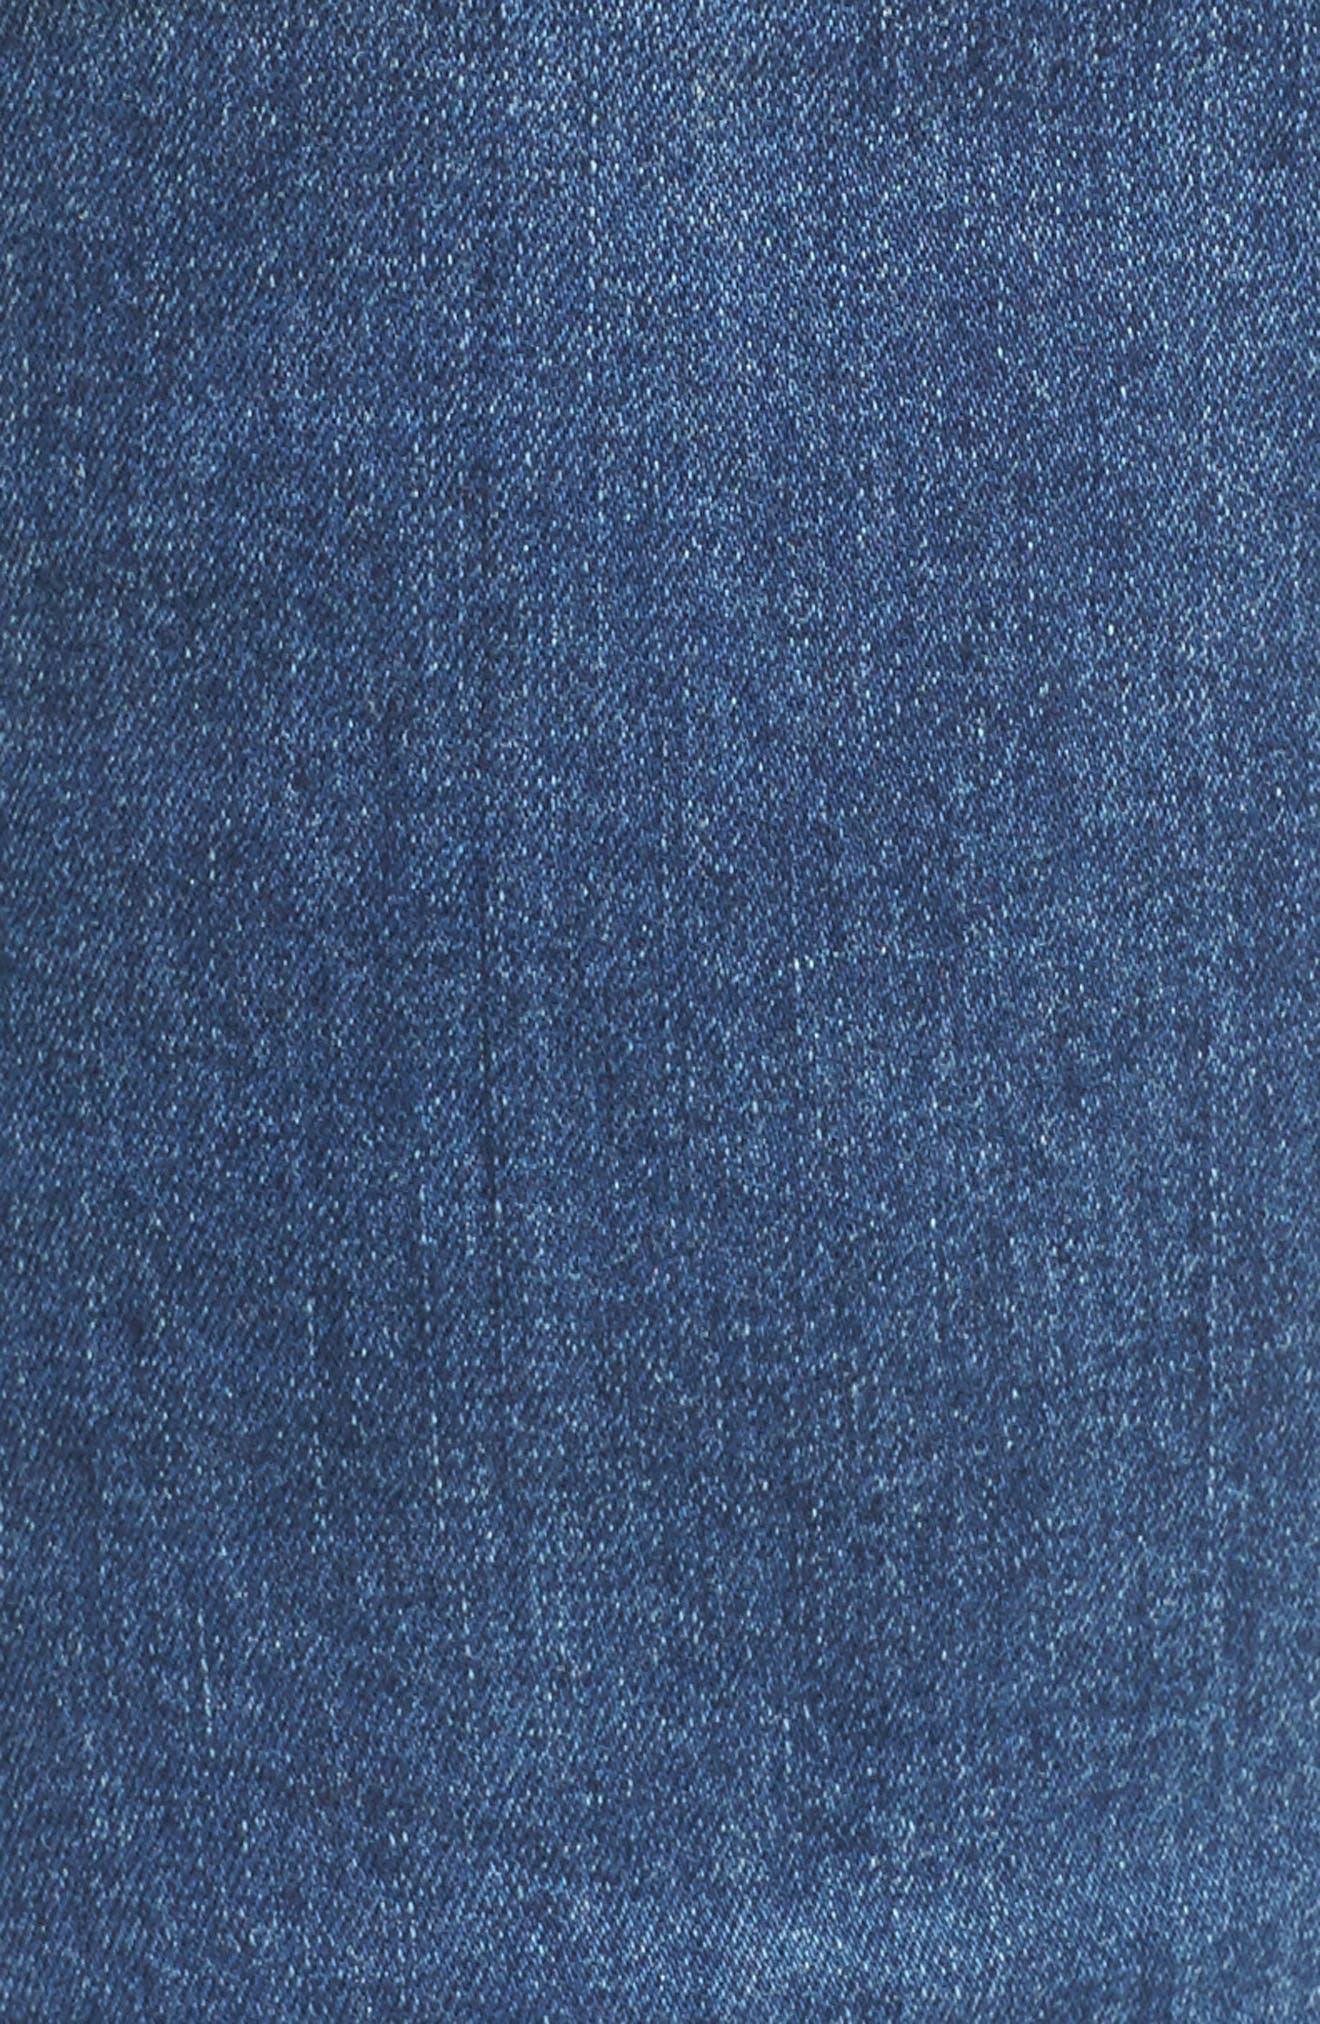 Alternate Image 5  - Seven7 Distressed Slim Raw Hem Cuffed Jeans (Concorde) (Plus Size)